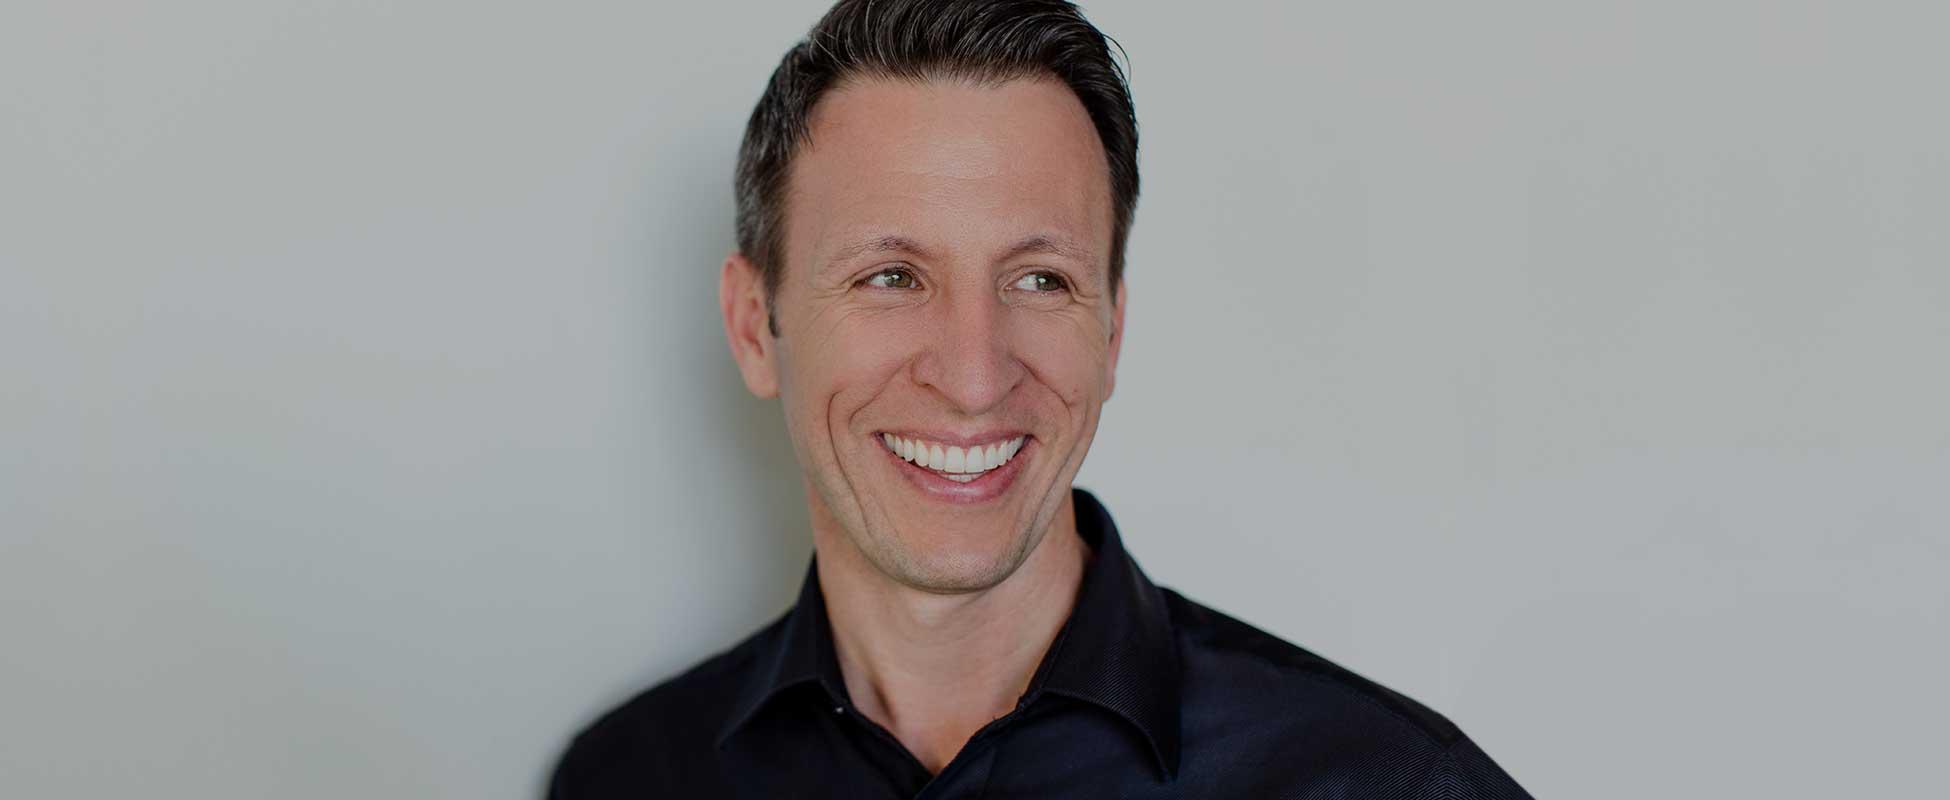 Chandler AZ Orthodontist Dr. Aubrey Young